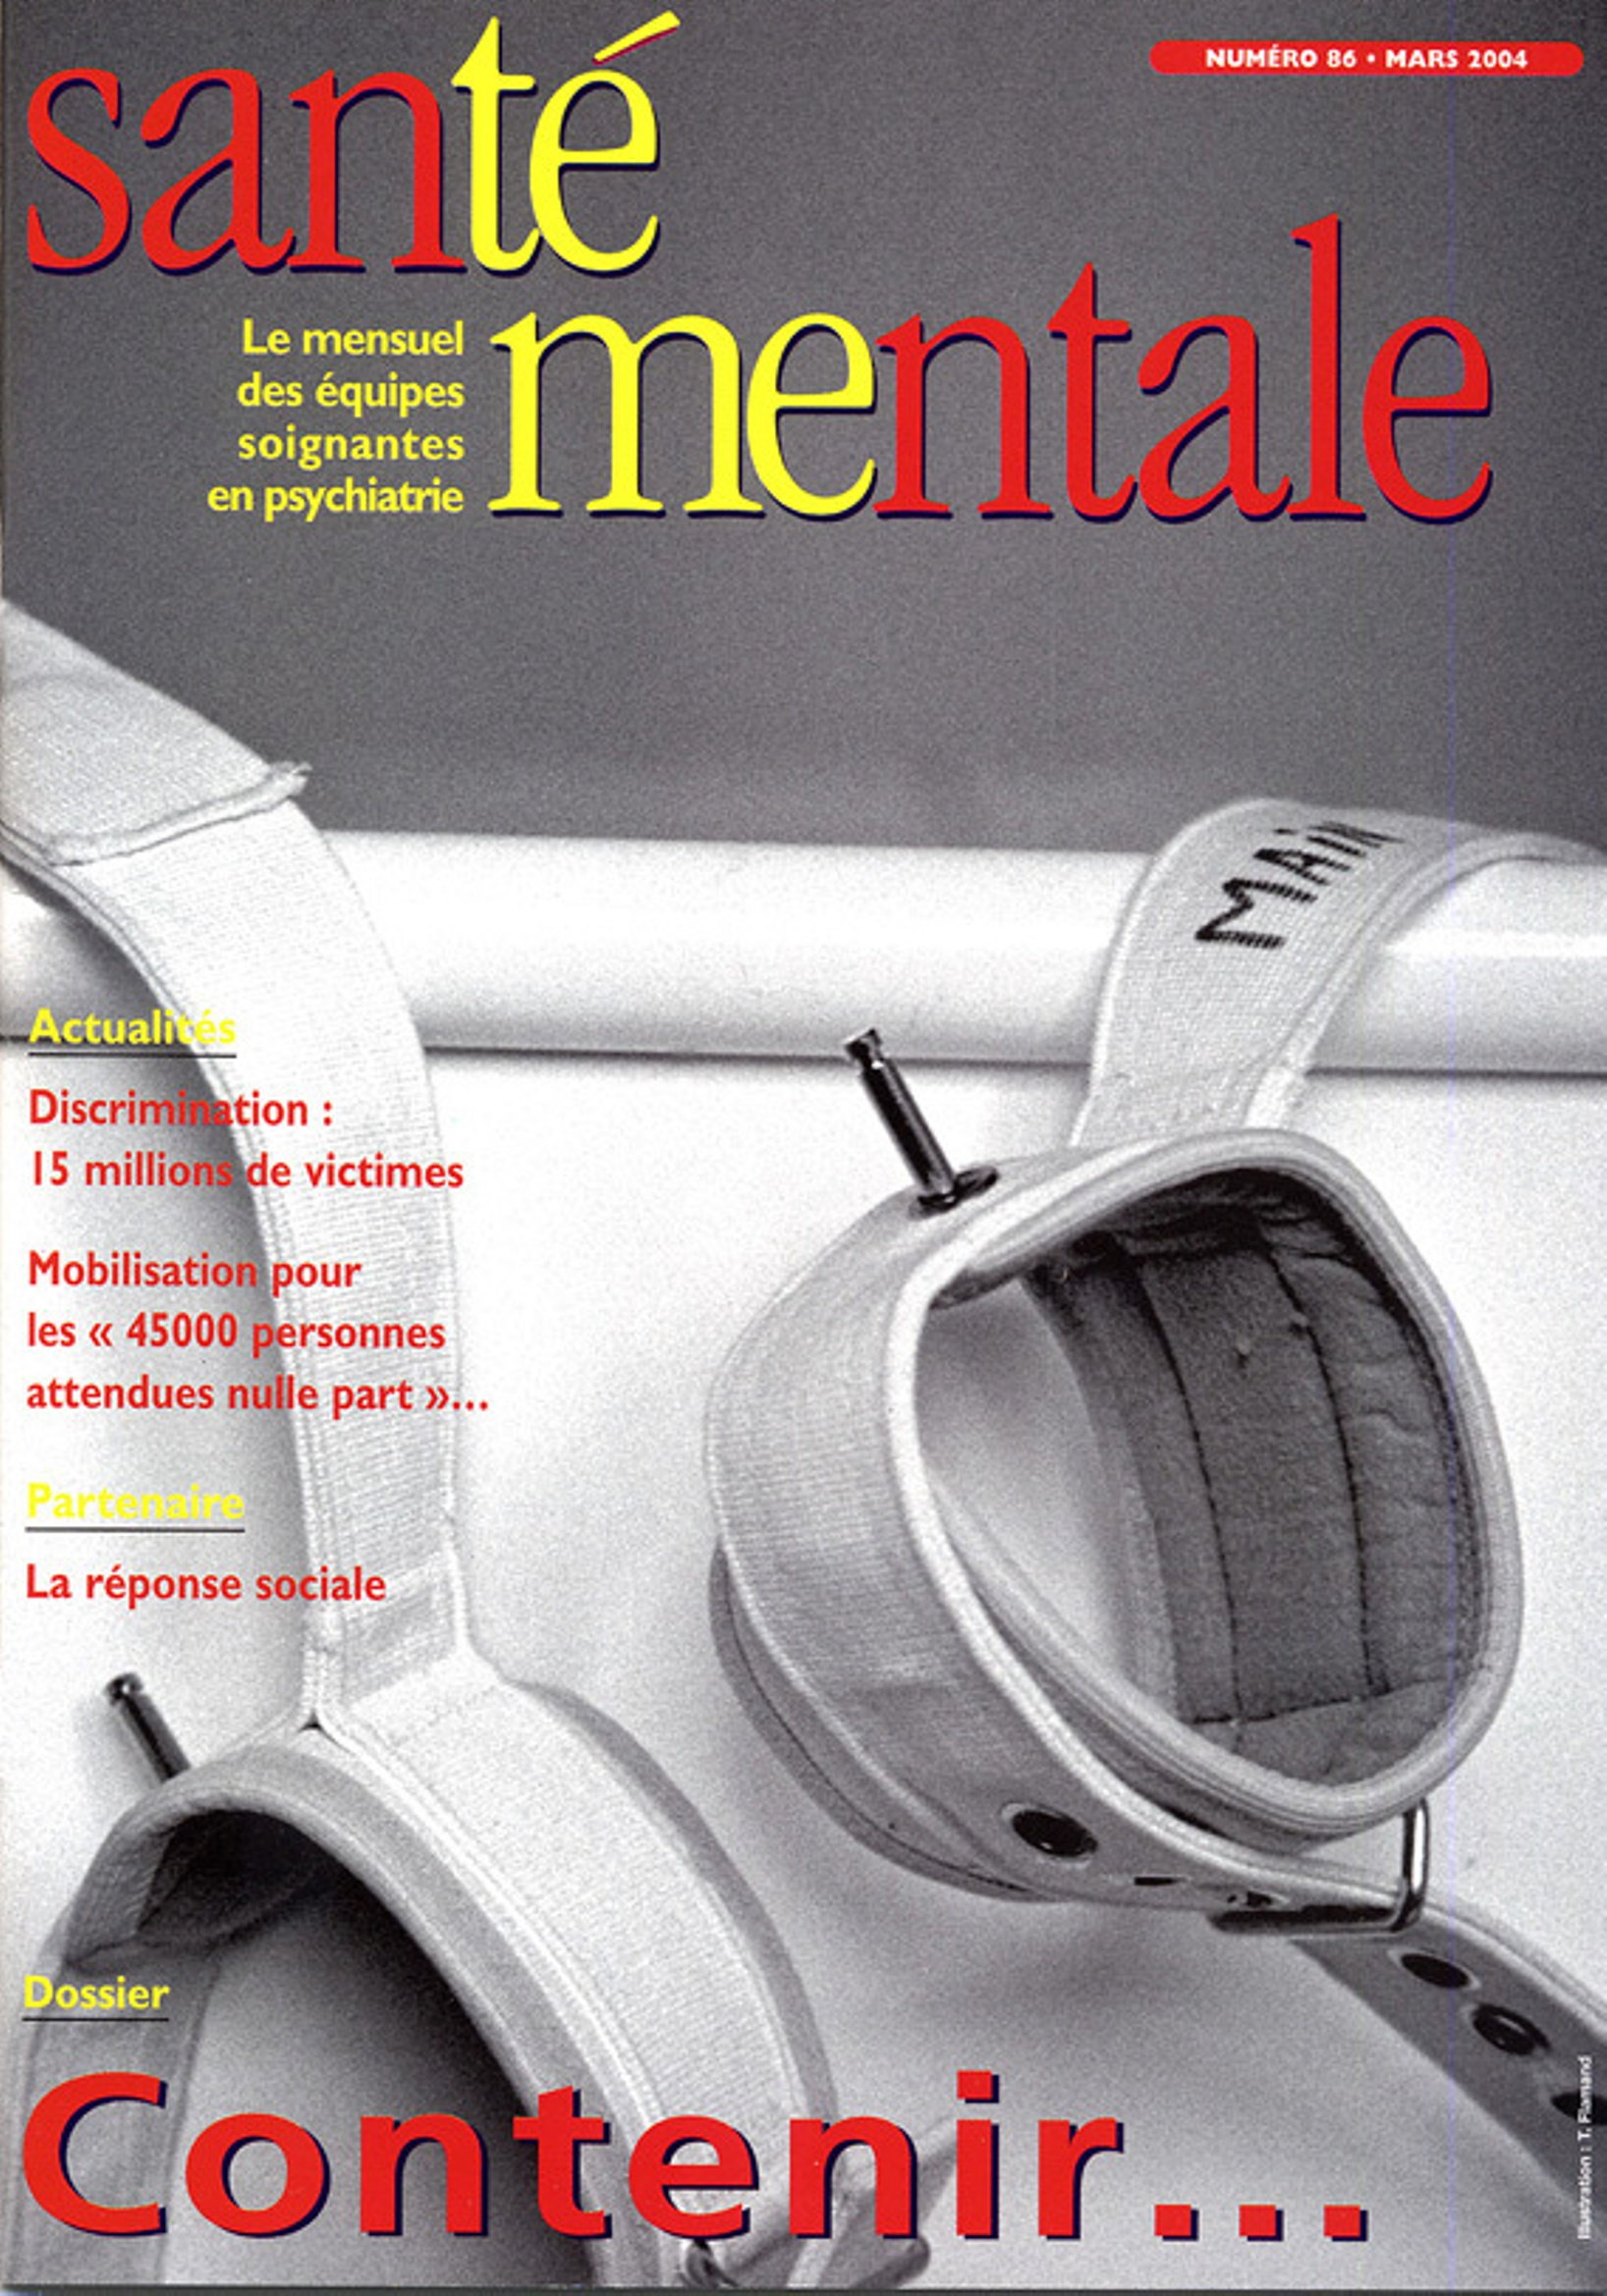 Couverture N°86 mars 2004